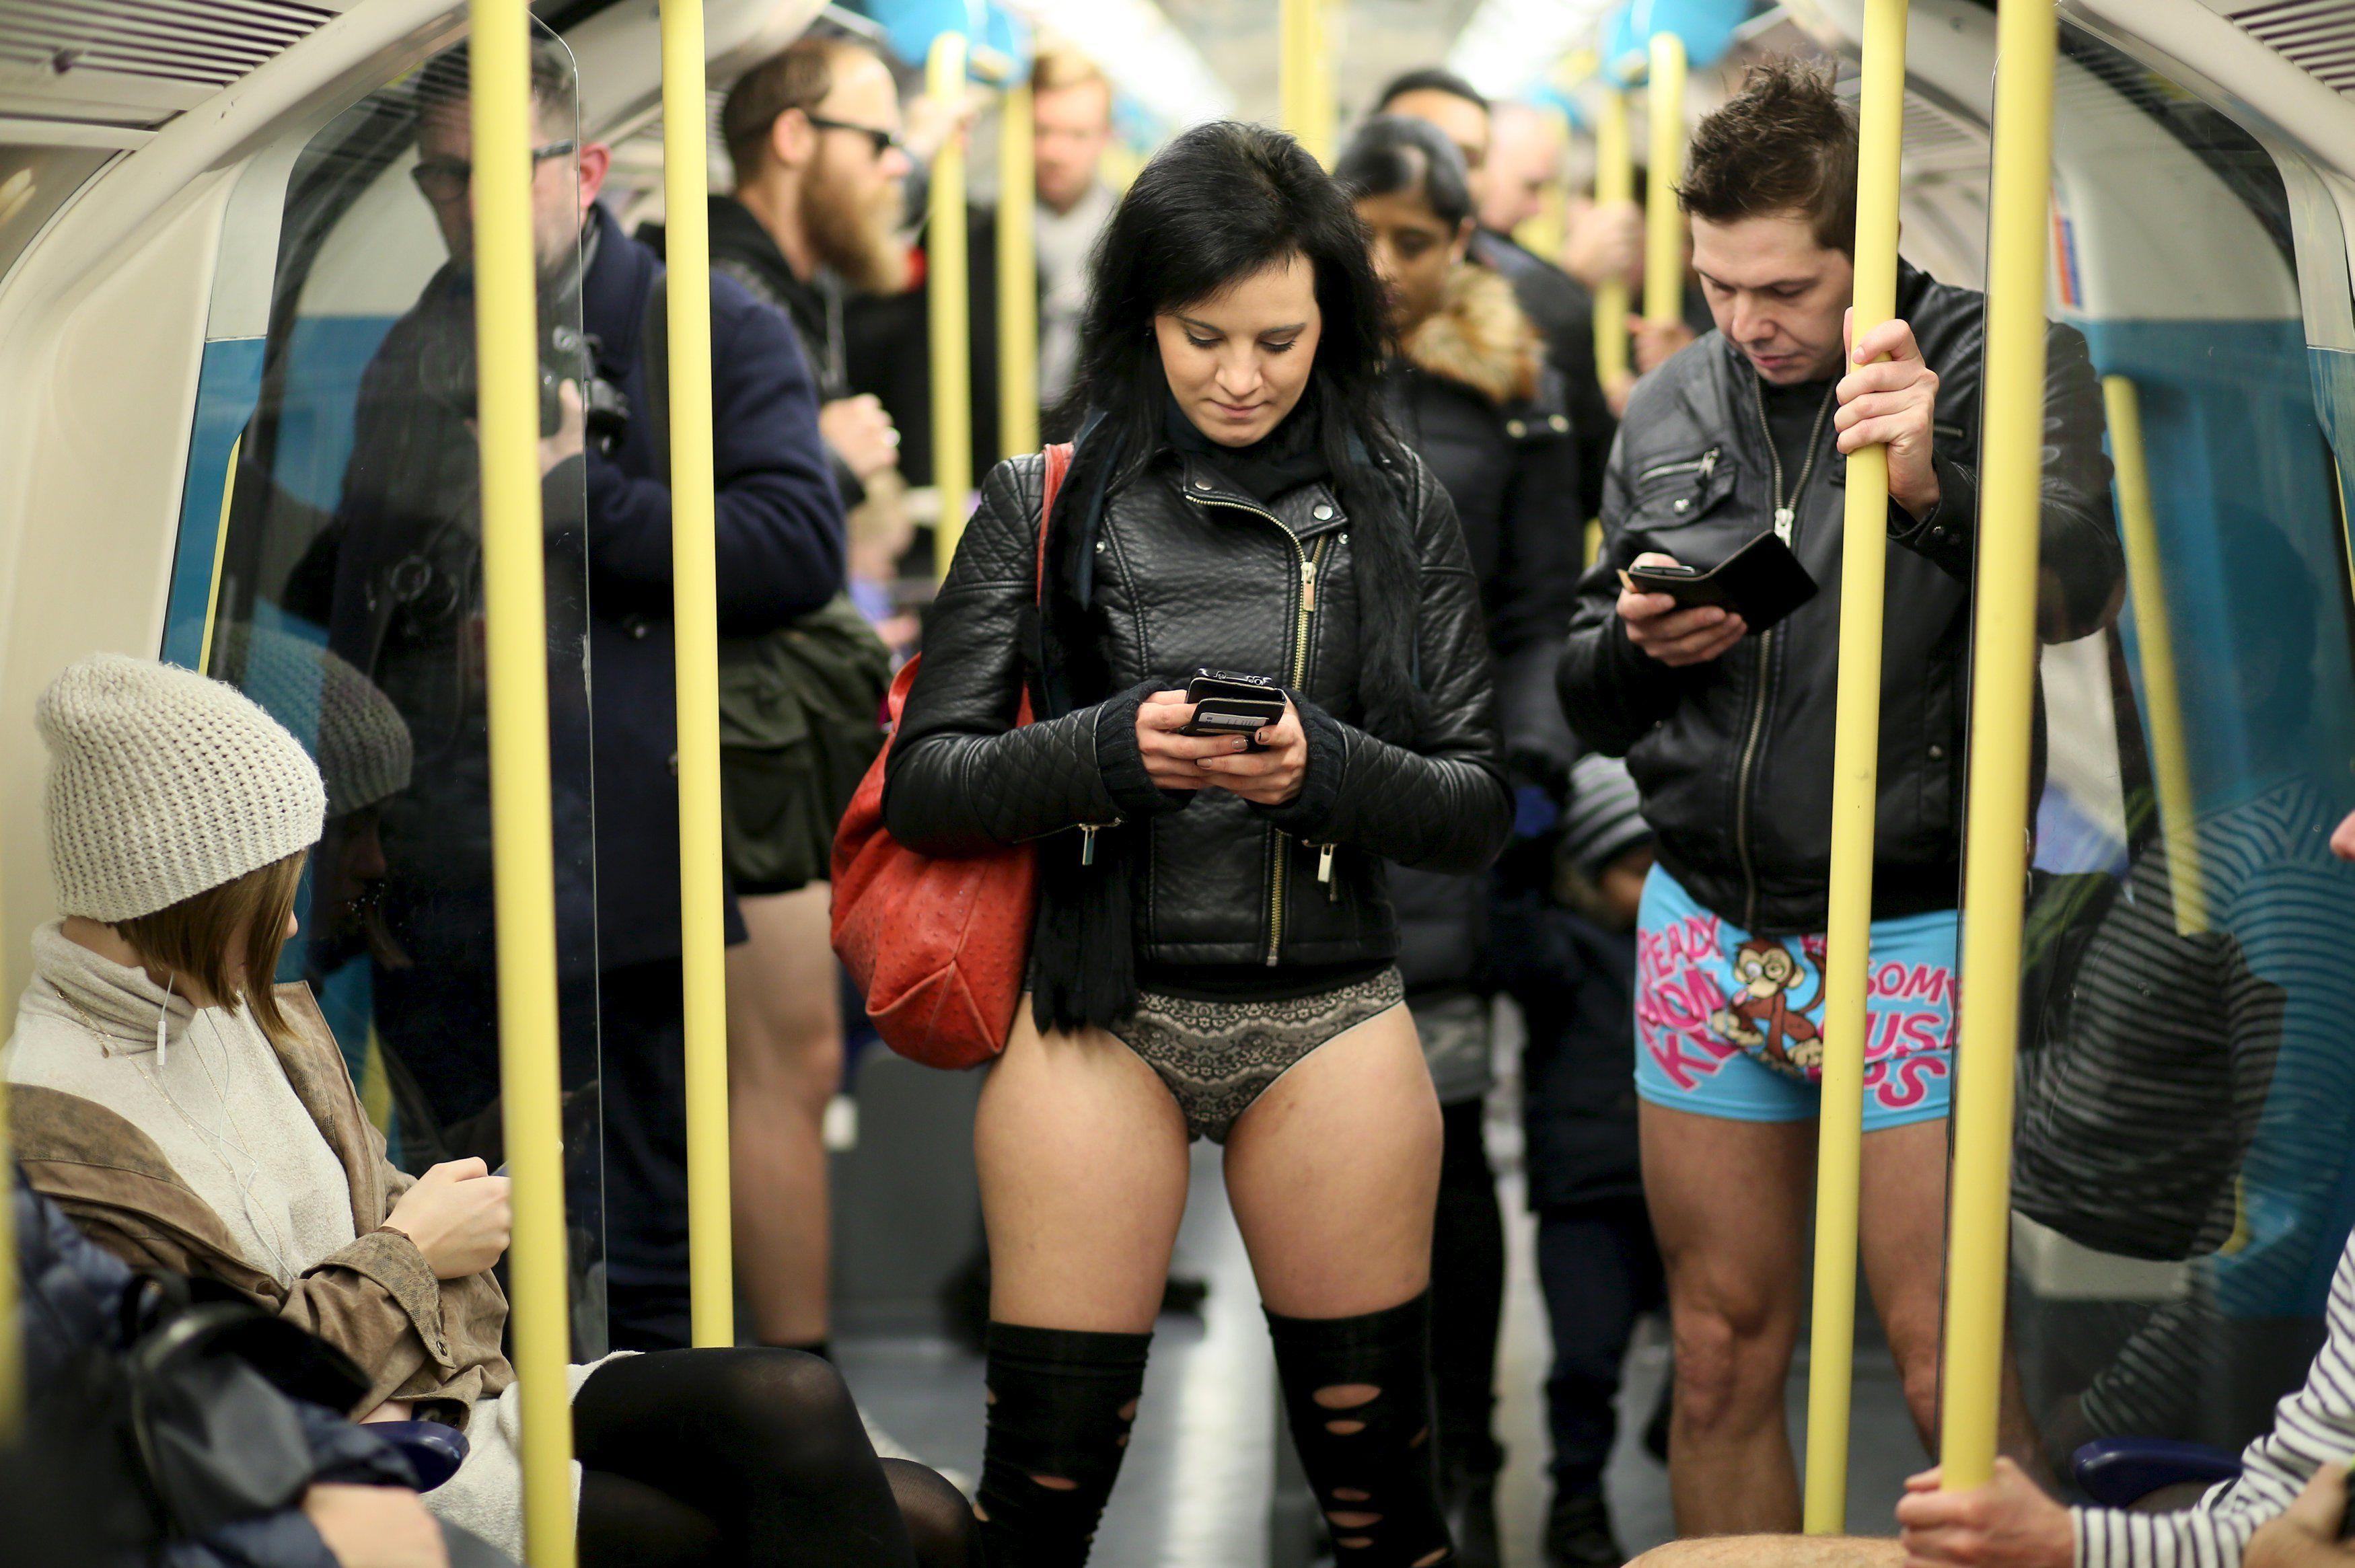 free nude in public pics  565761